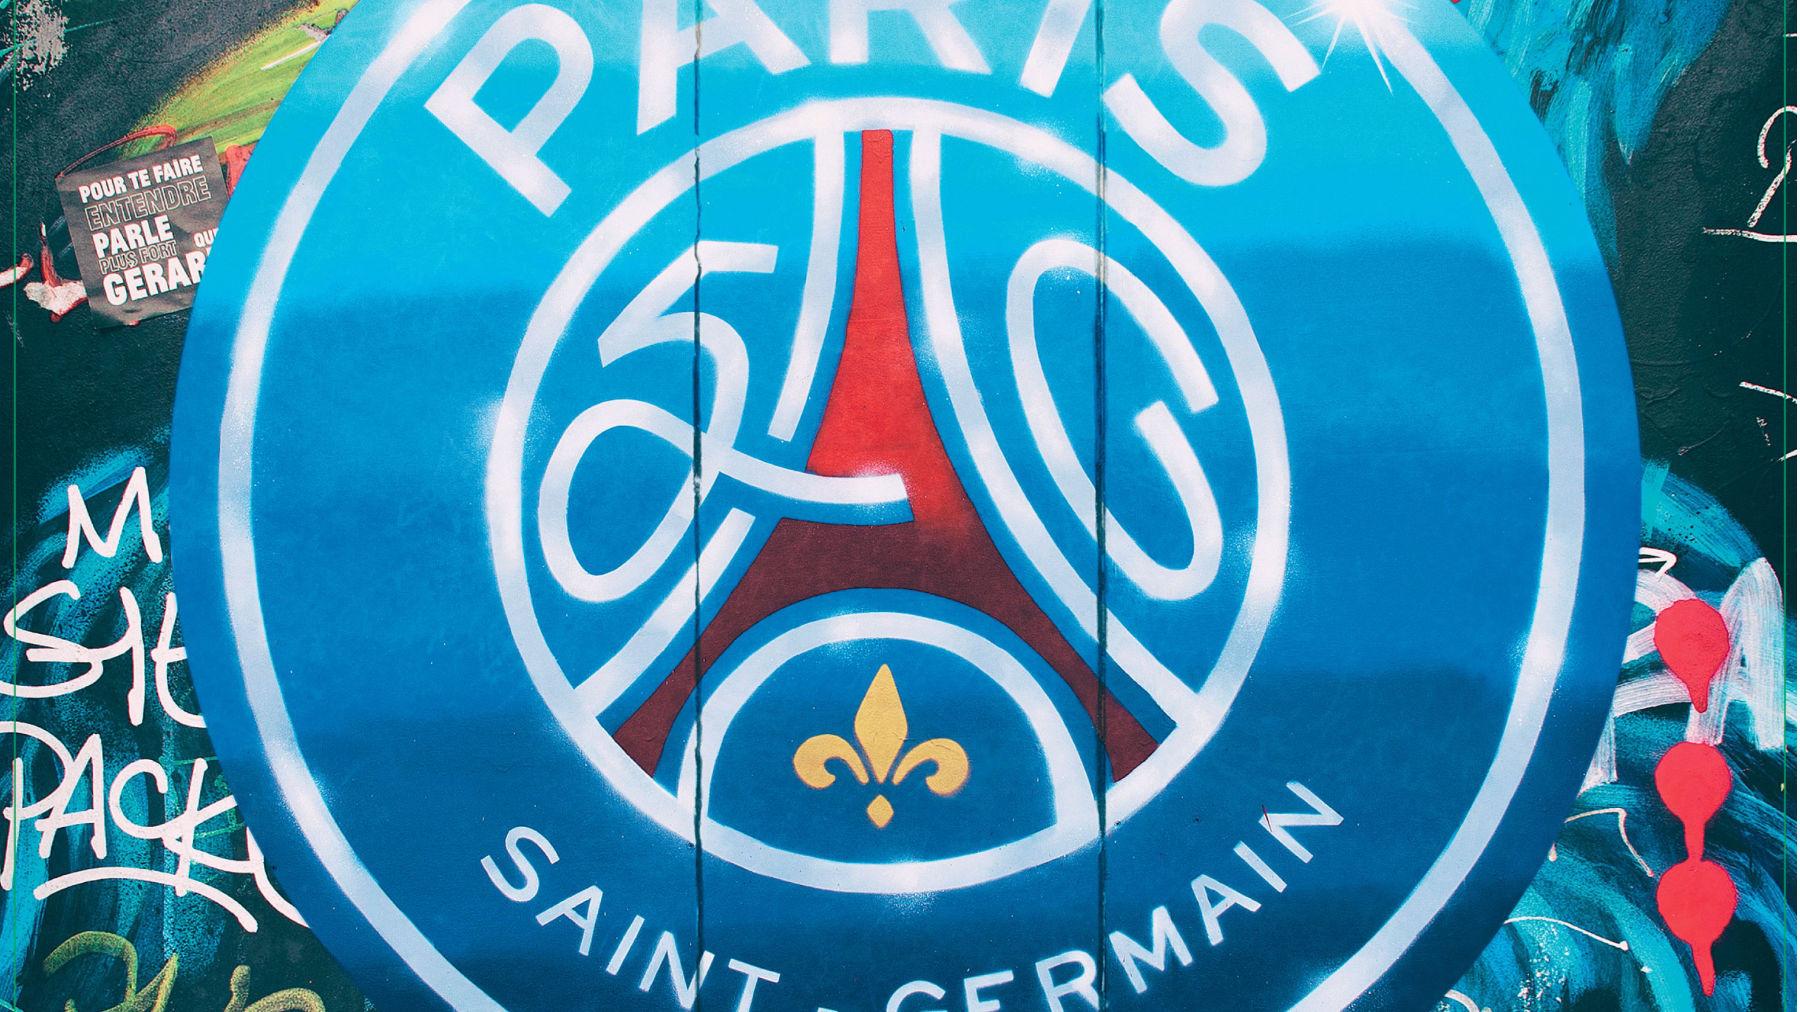 Psg S 50th Anniversary Logo Revealed Psg Talk